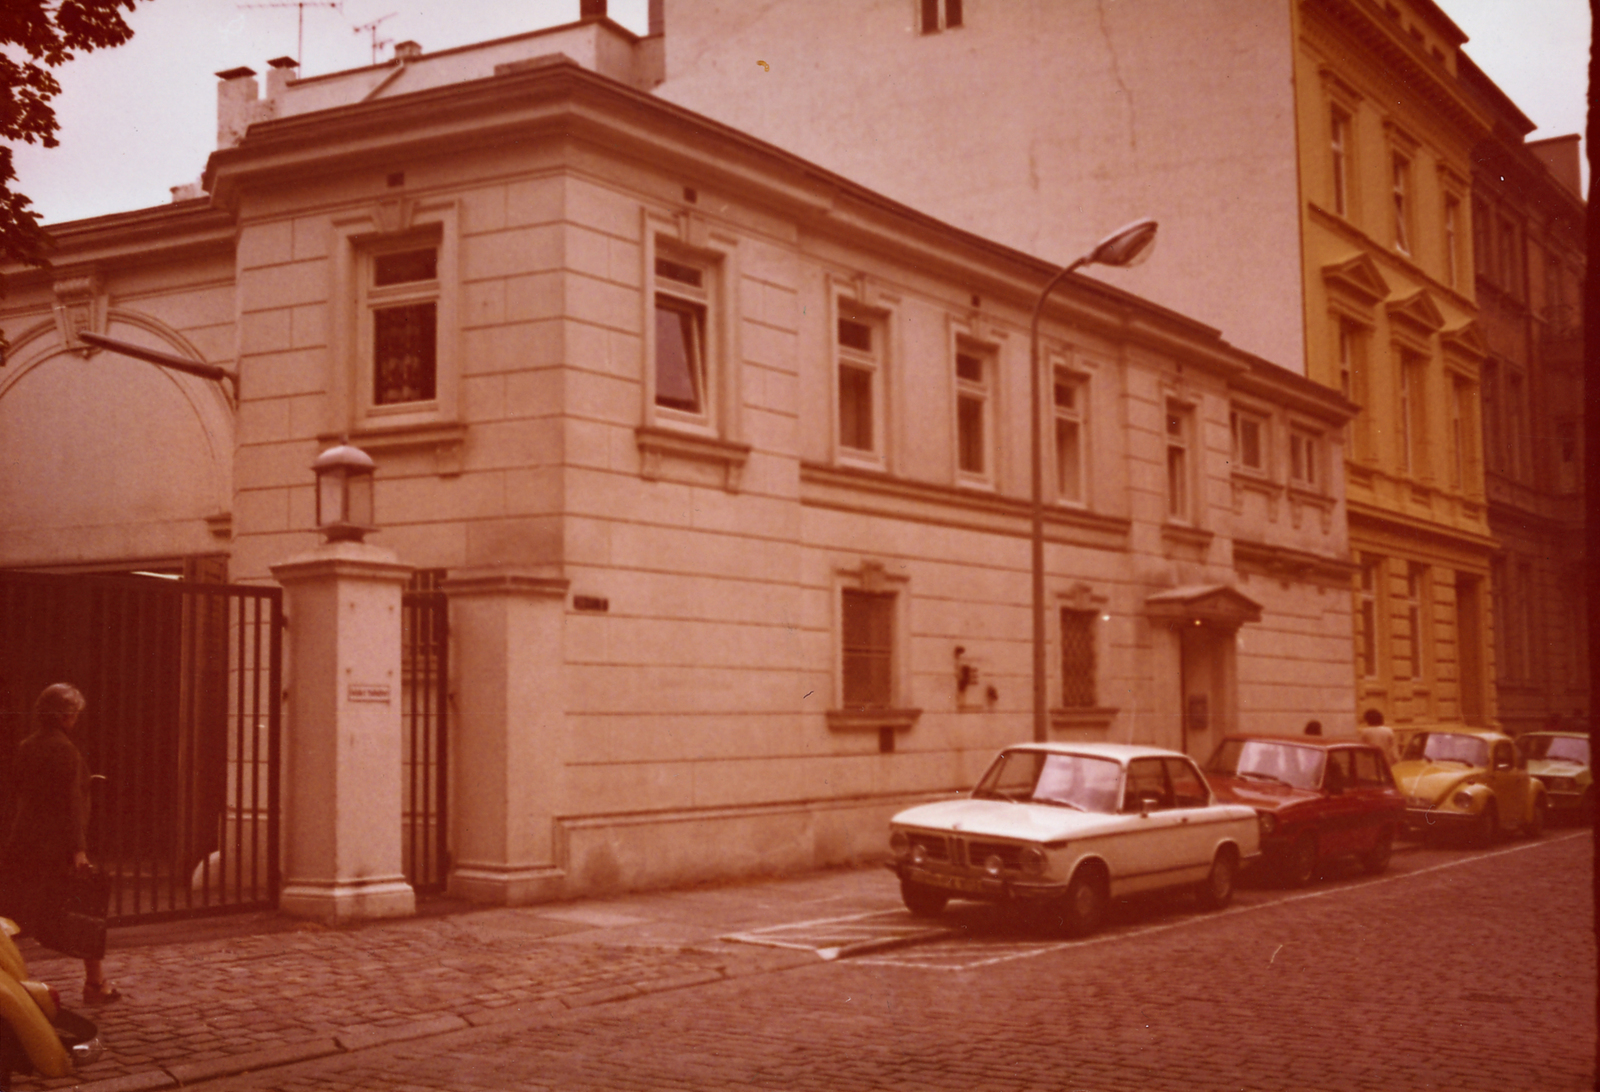 Hamburg - Temporary Duty/Transient Residential Unit - 1977